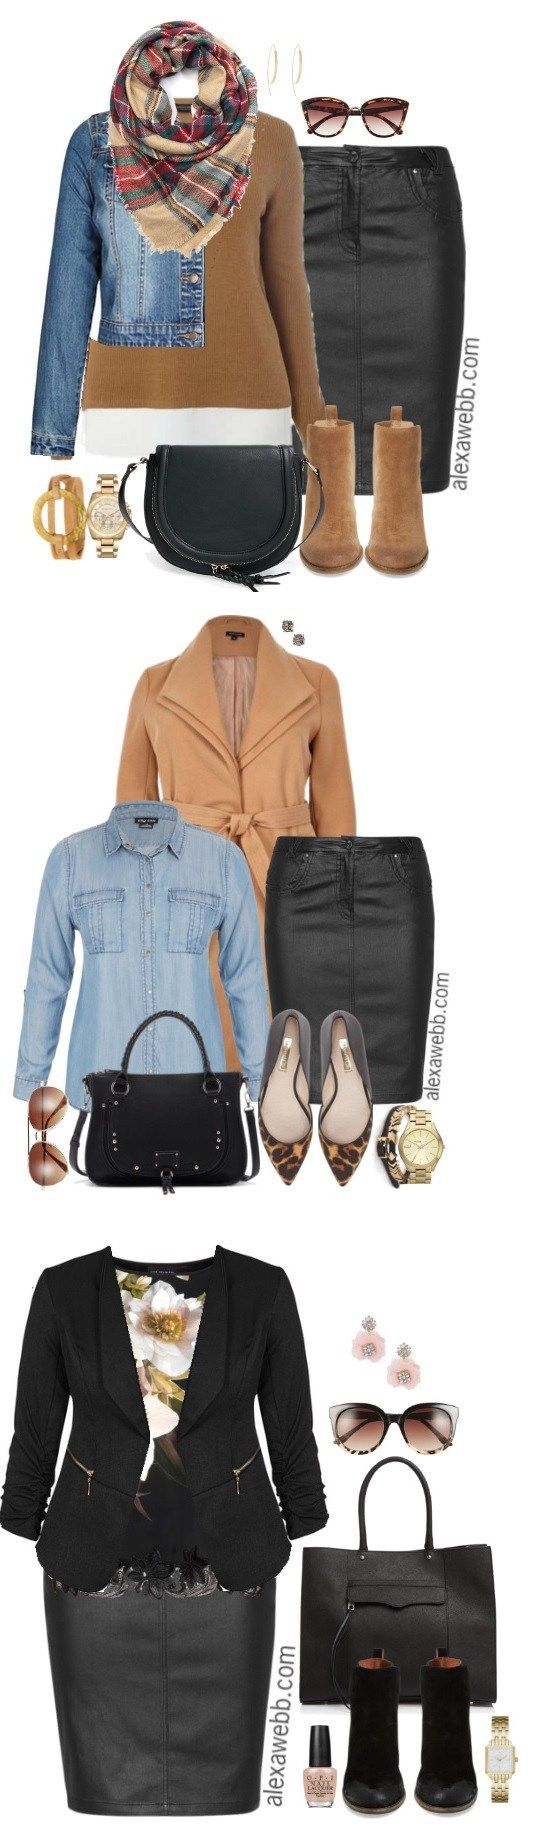 Plus Size Faux Leather Skirt {3 Ways} - Plus Size Outfit Ideas - Plus Size Fashion for Women - alexawebb.com #alexawebb